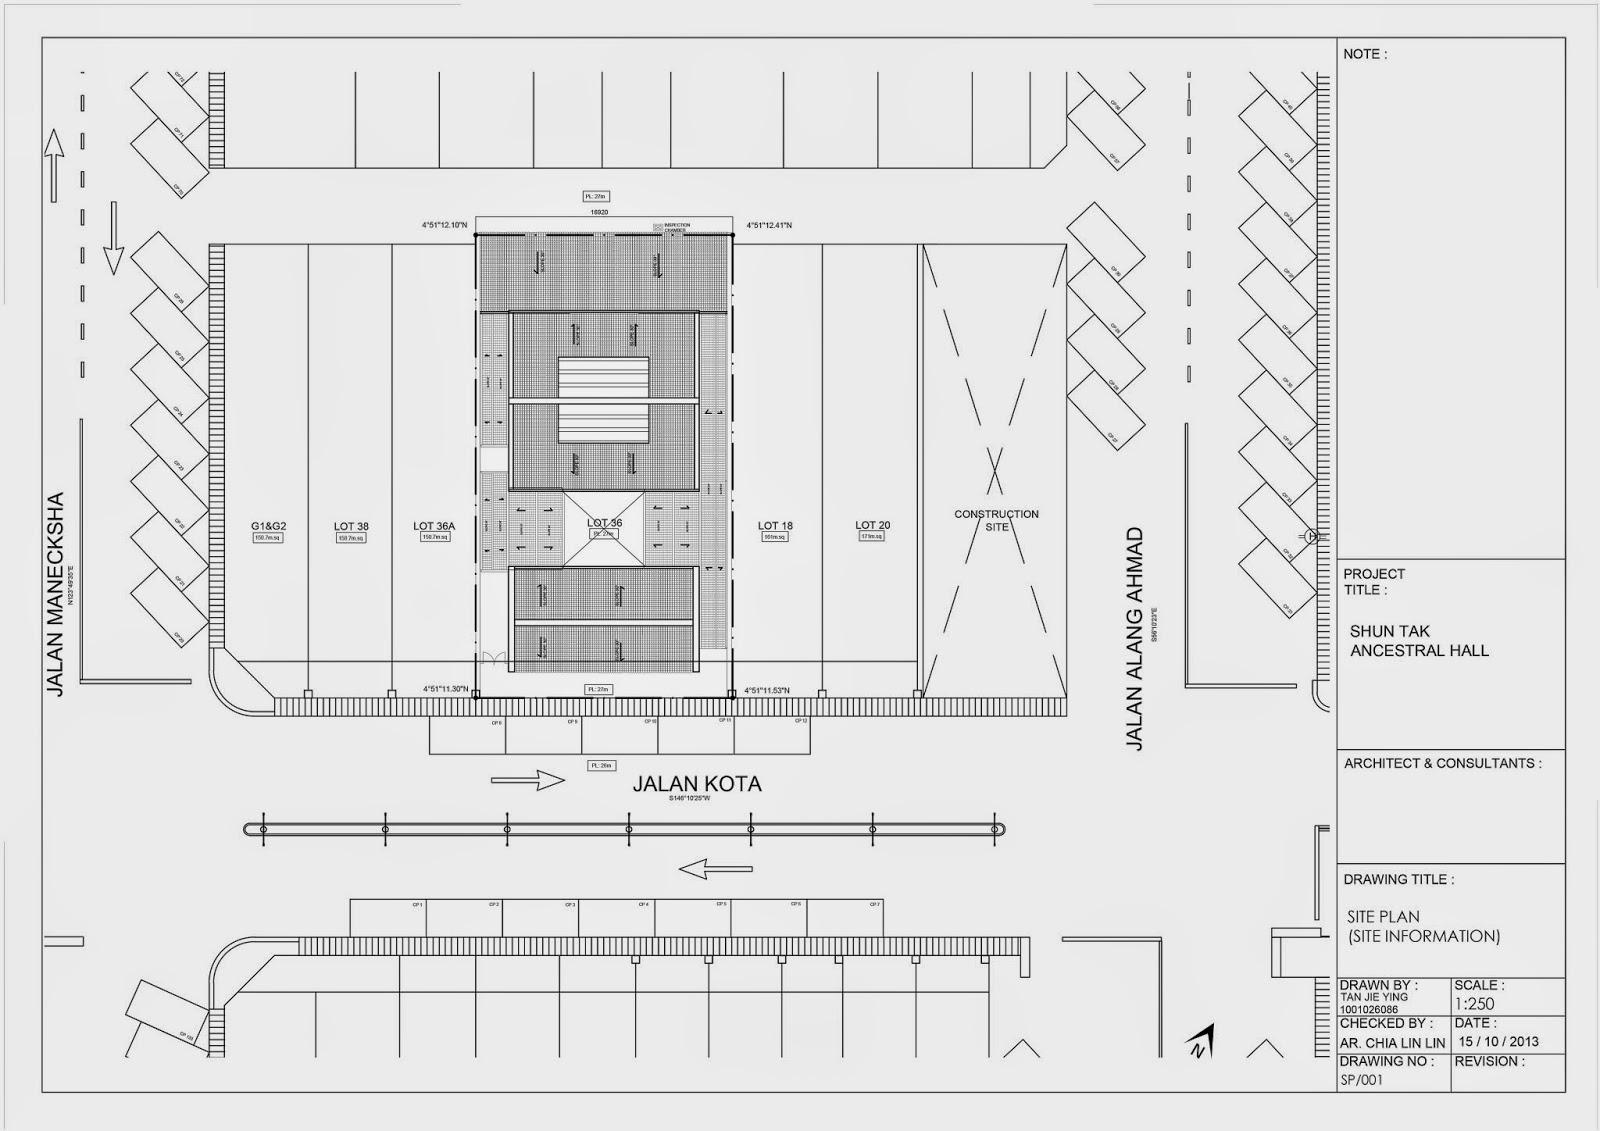 Jie Ying's Portfolio: Re-vitalizing STA Ancestral Hall